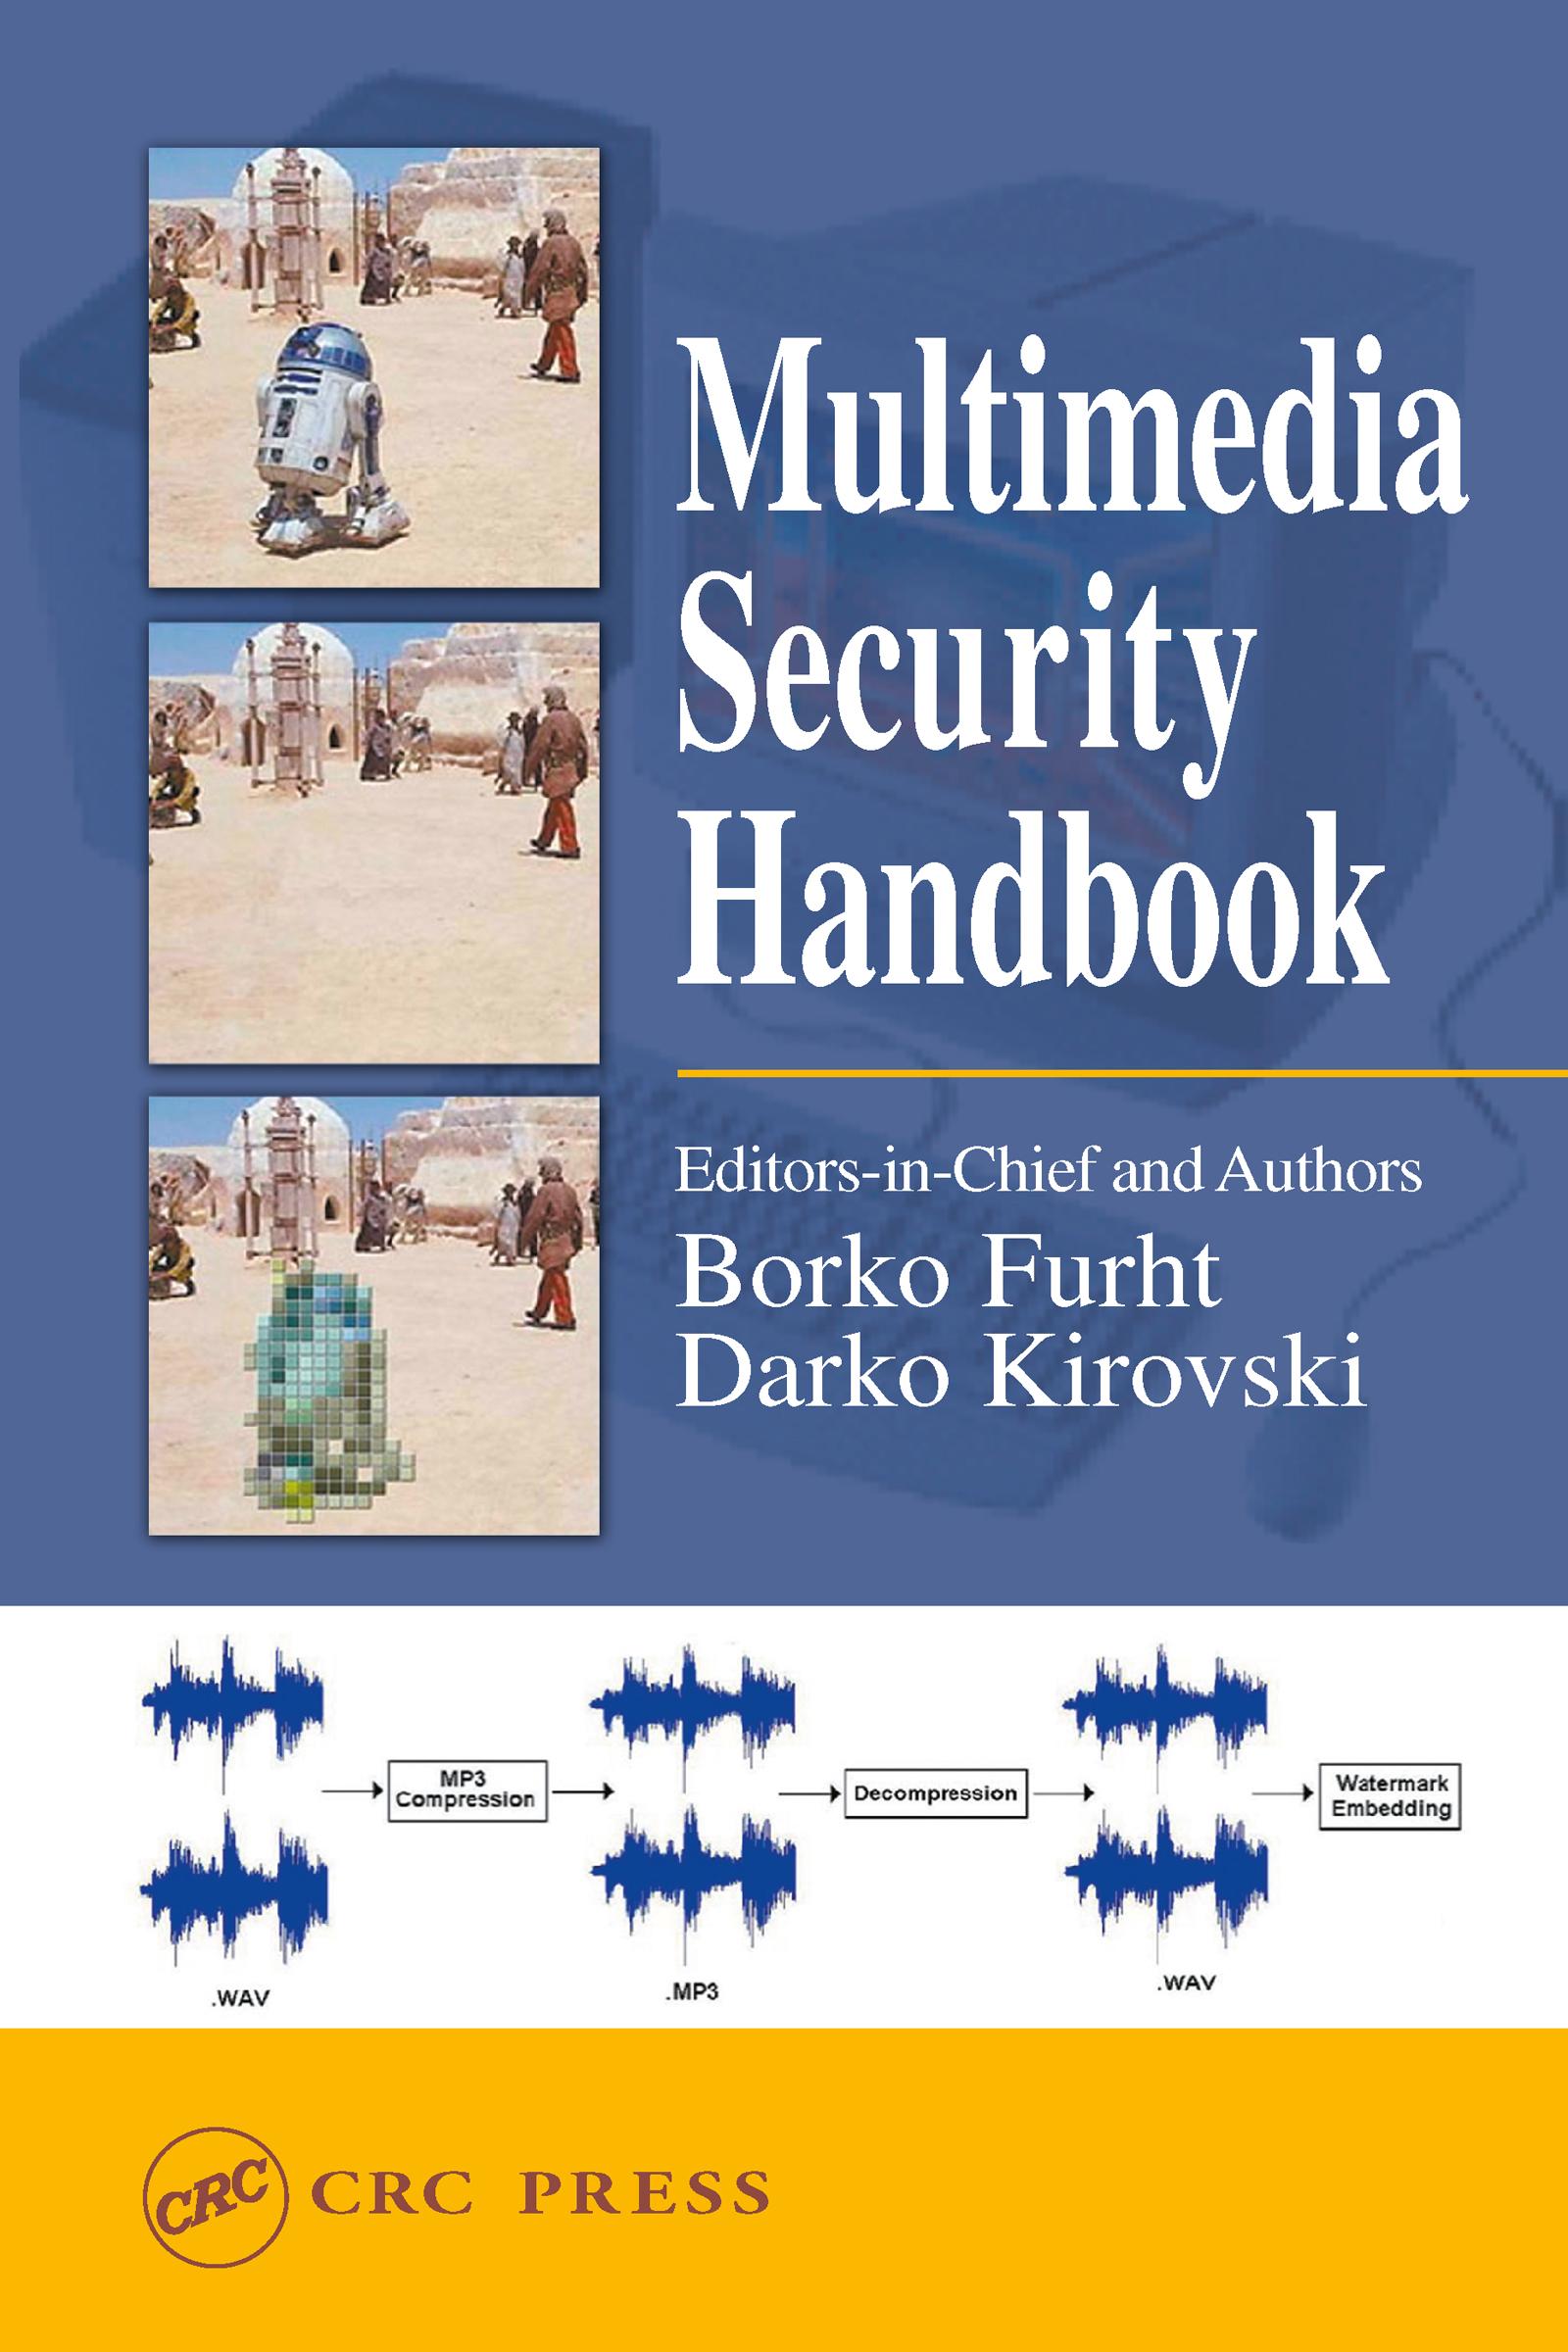 Multimedia Security Handbook book cover